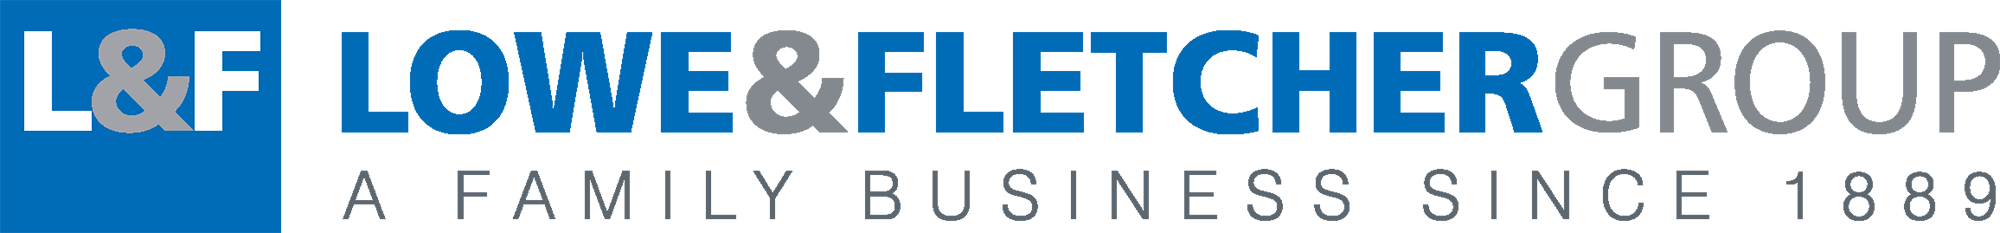 Lowe Fletccher logo identity design Wendsbury